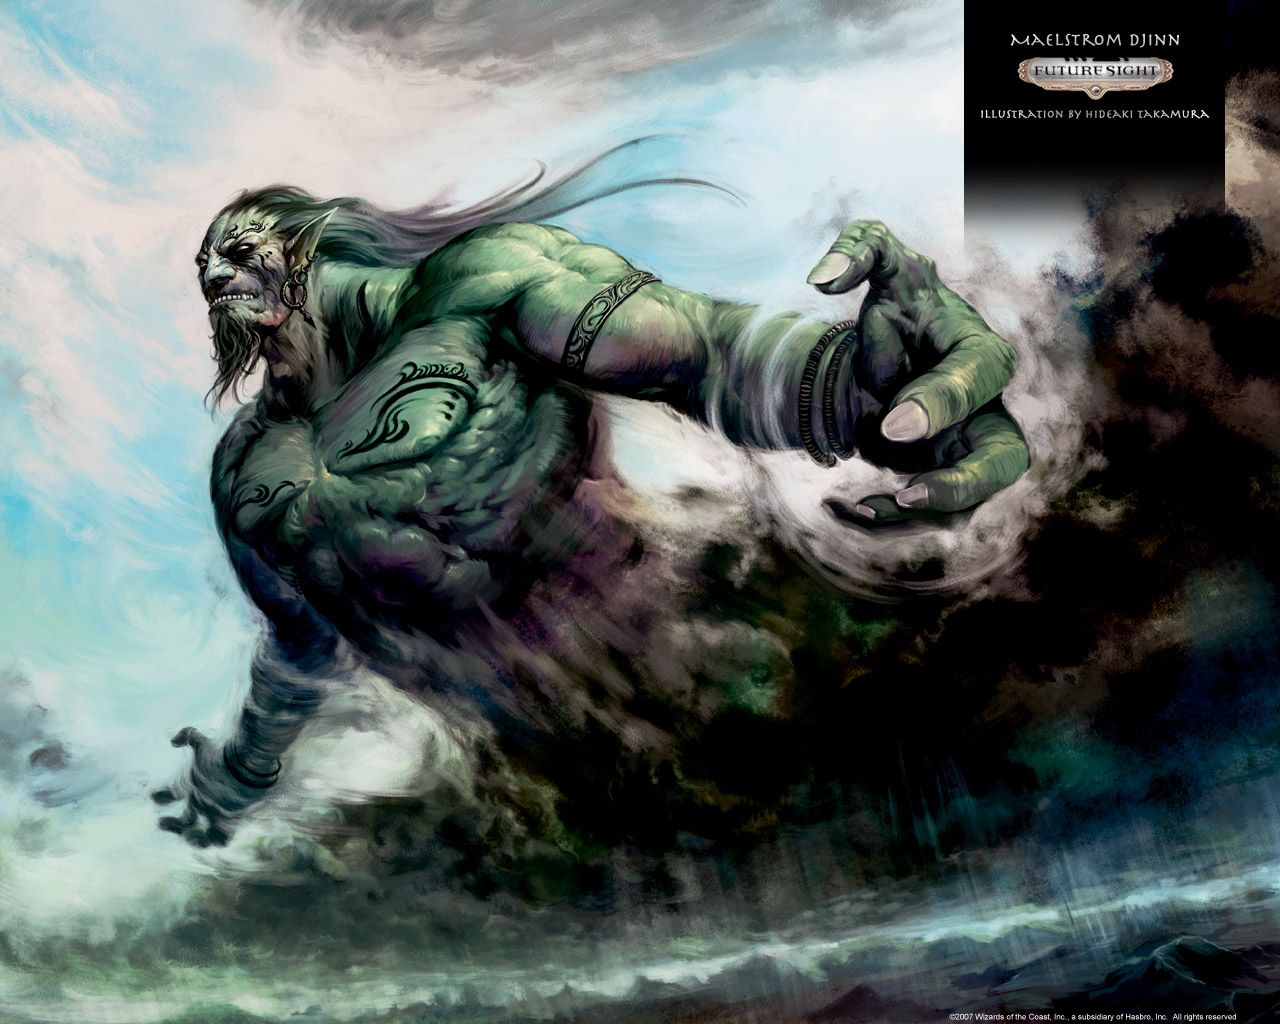 Maelstrom Djinn #comic #book #art #wallpaper | The Art Of Comics in